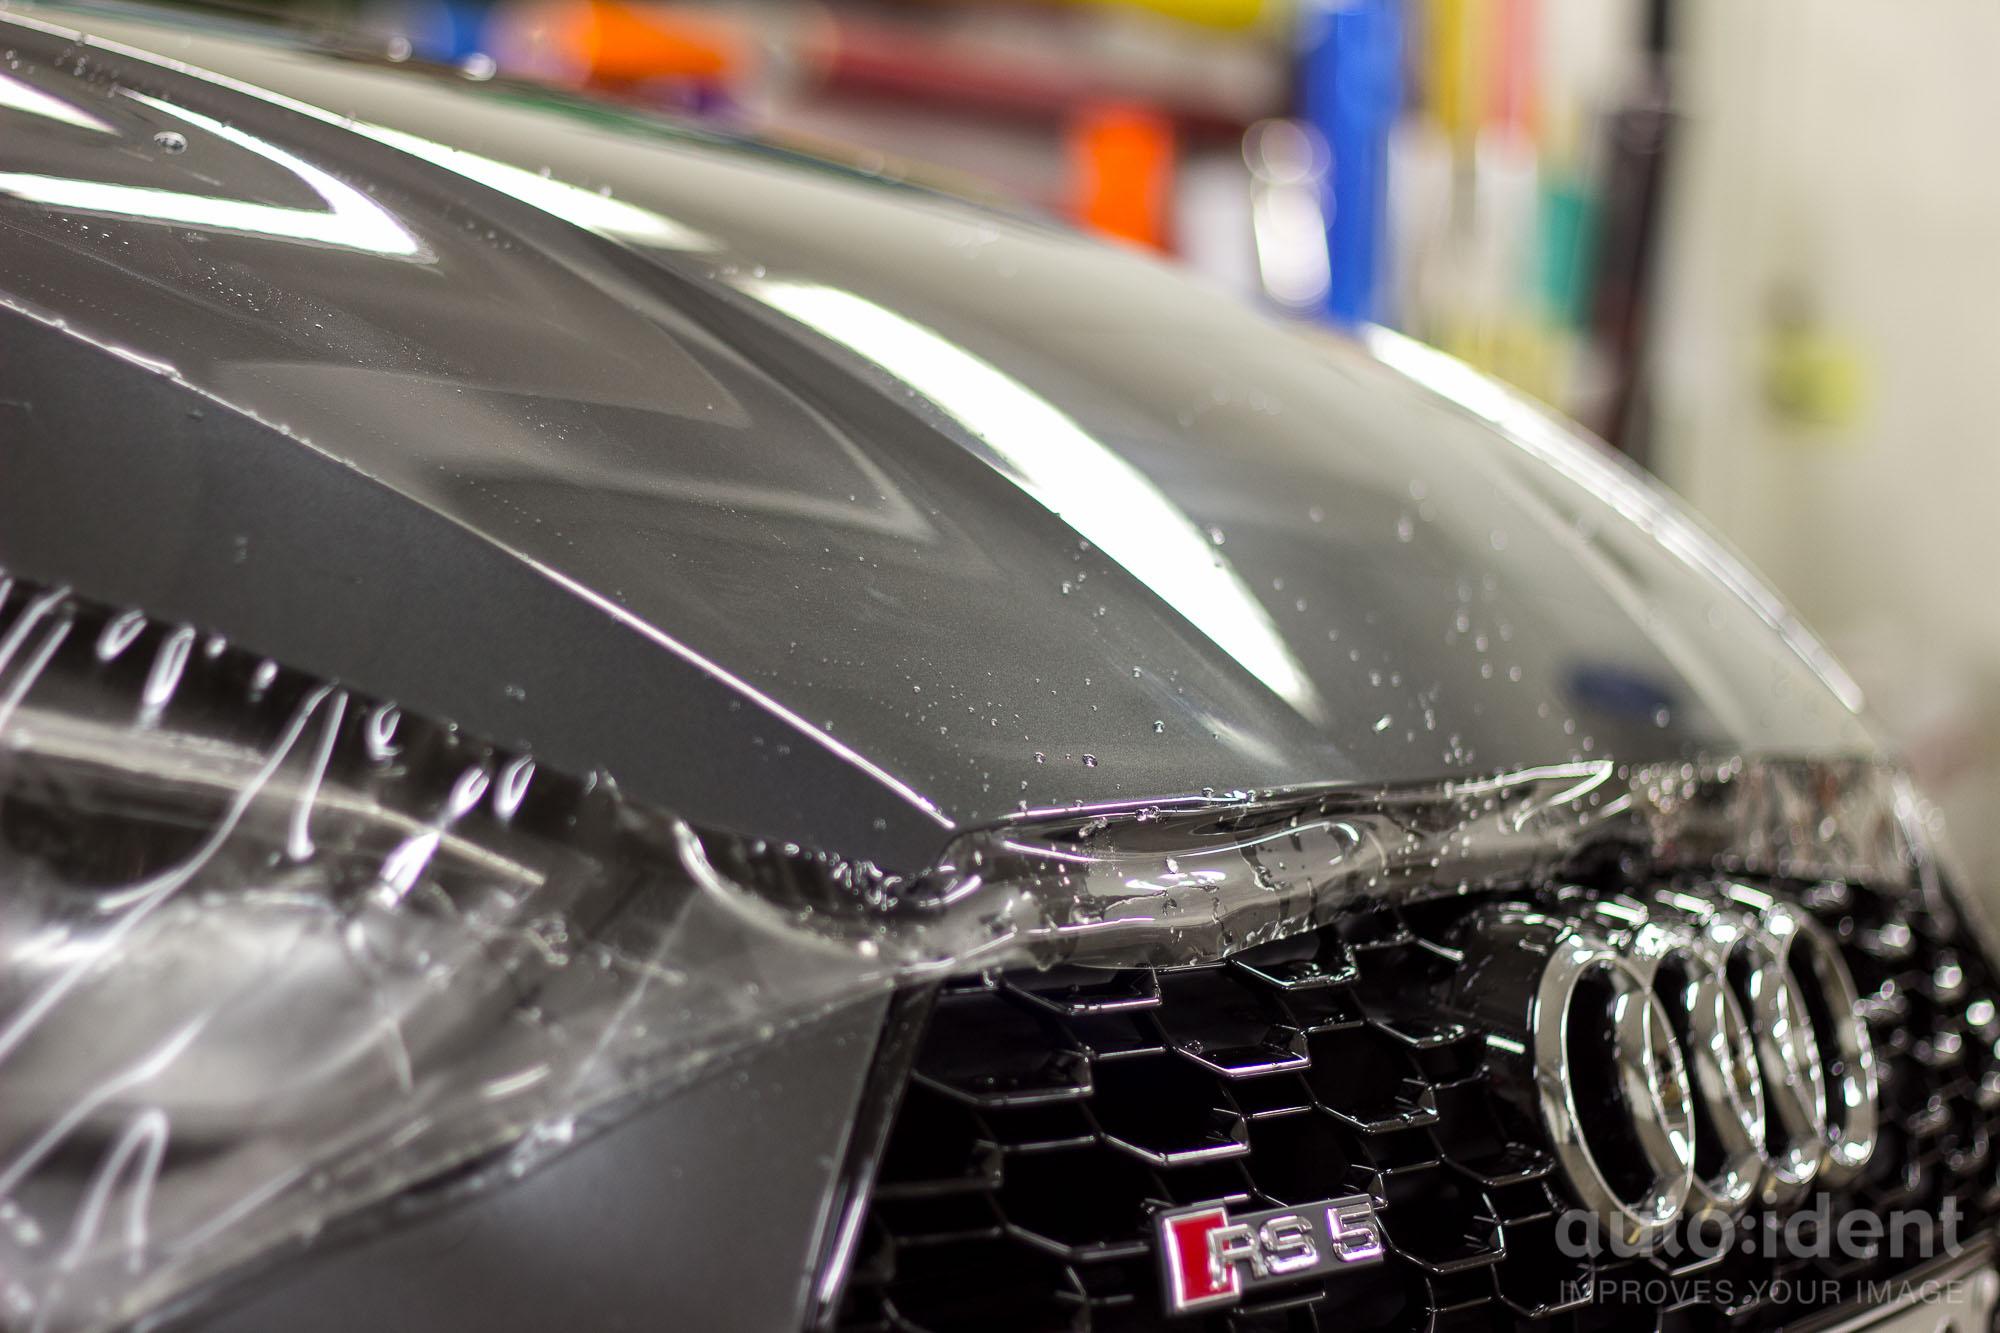 Audi Rs5 Paintprotection Zoomhood Auto Ident